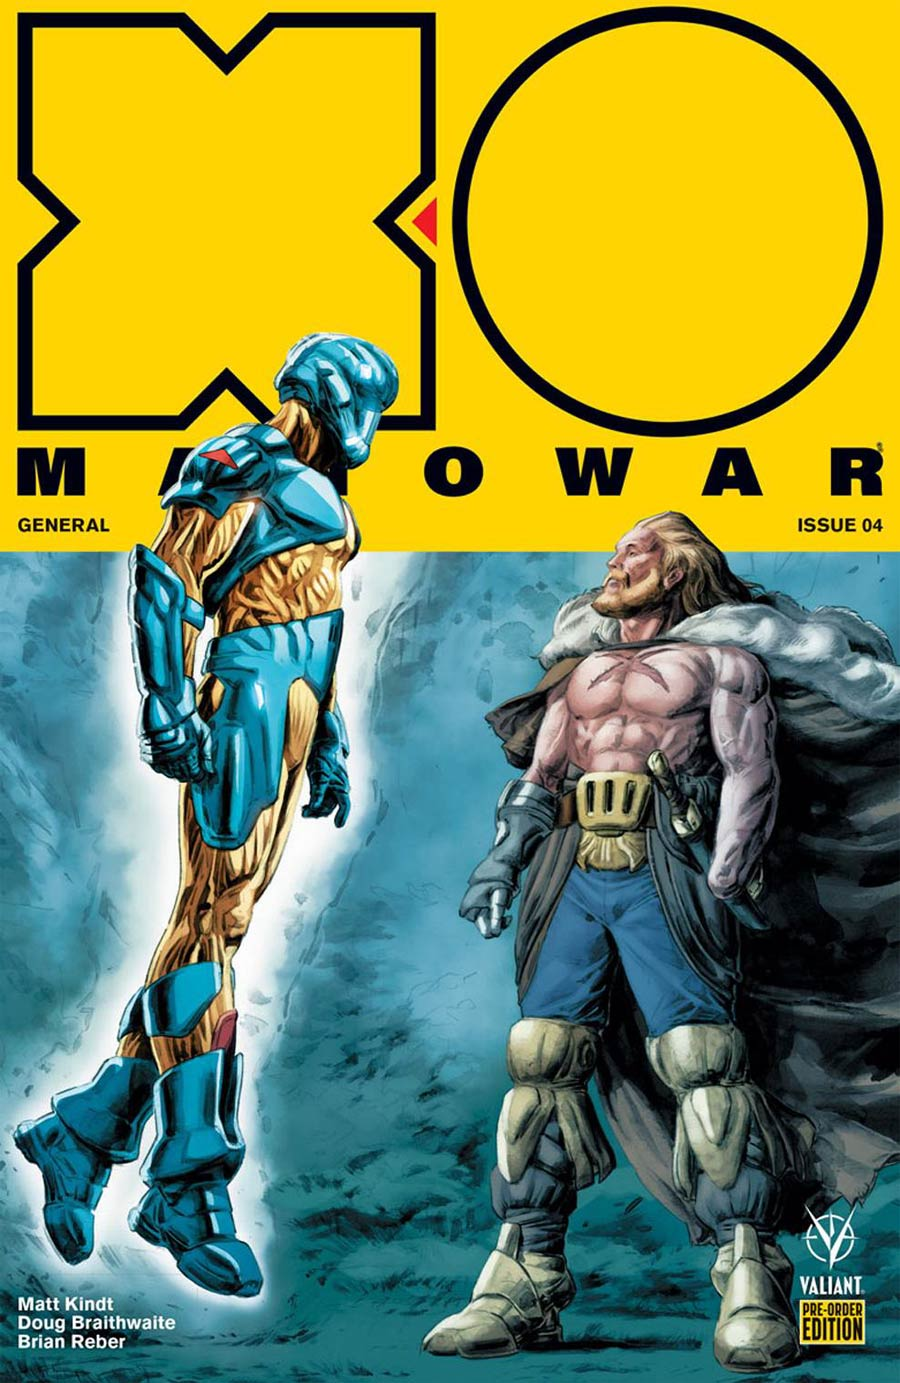 X-O Manowar Vol 4 #4 Cover C Variant Doug Braithwaite Cover